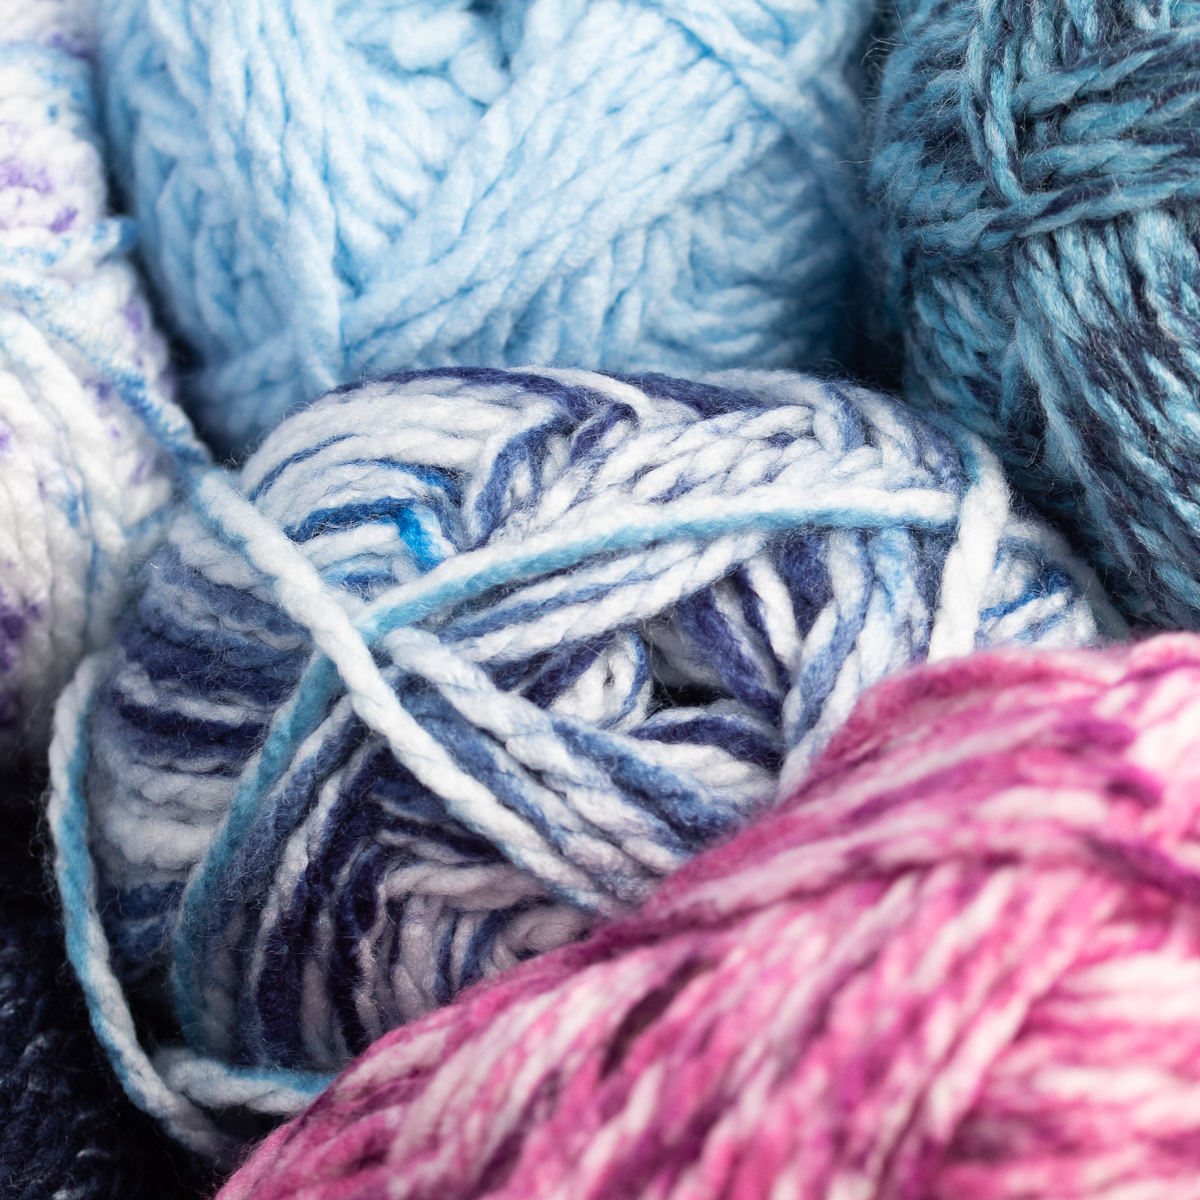 3pk-Premier-Yarns-Deborah-Norville-Serenity-100-Acrylic-Yarn-Chunky-5-Knitting thumbnail 34